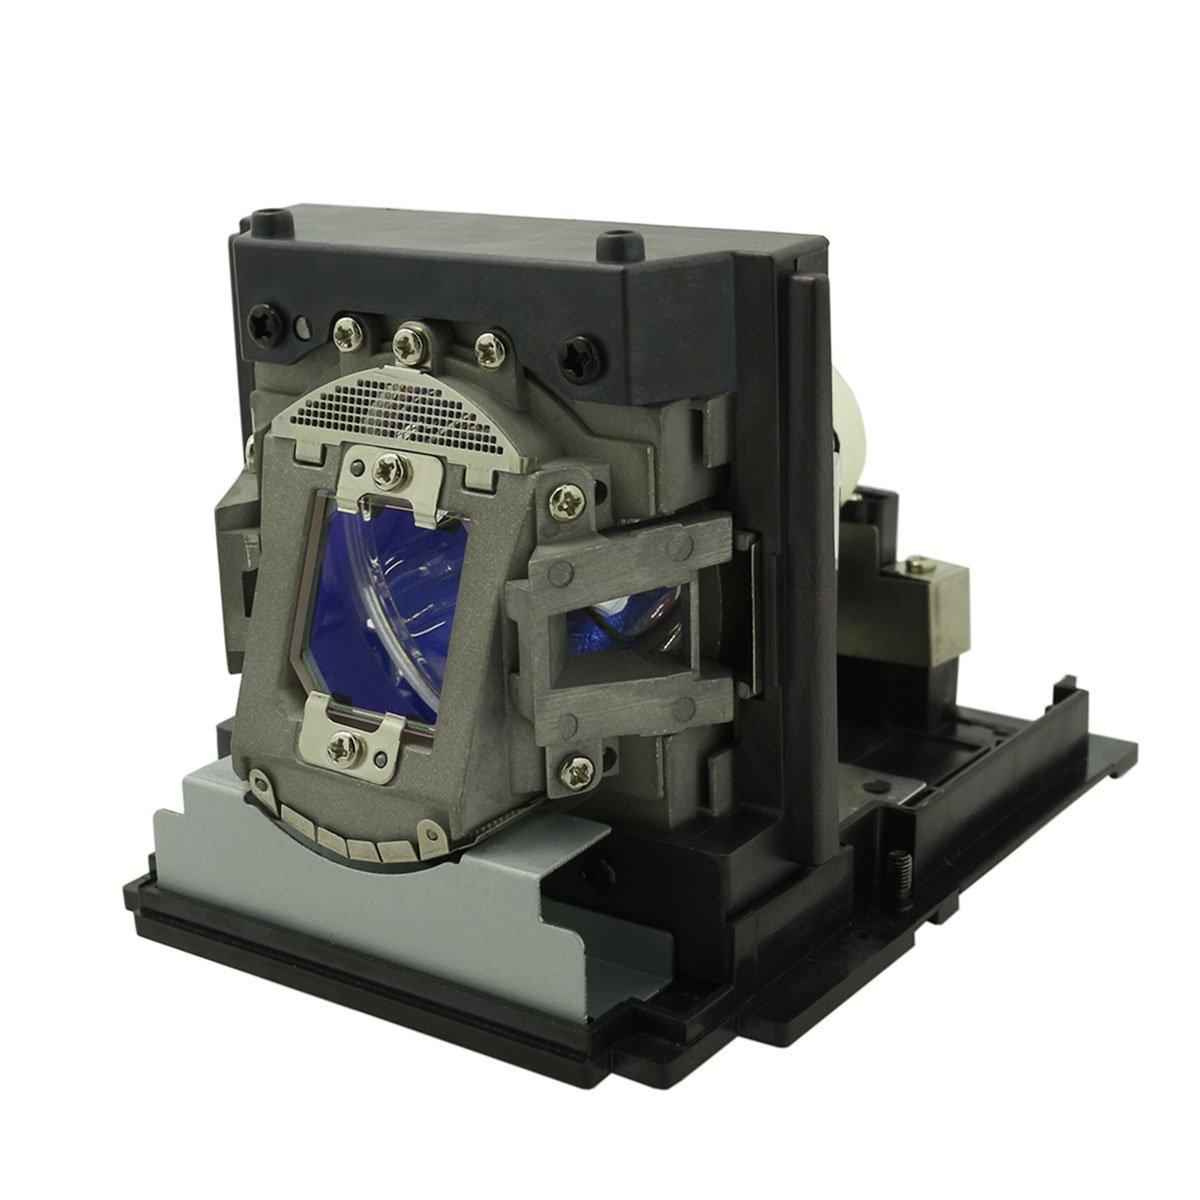 Osram オリジナルプロジェクター交換用ランプ Barco R9801015用 Platinum (Brighter/Durable) Platinum (Brighter/Durable) Lamp with Housing B07KTL69K8